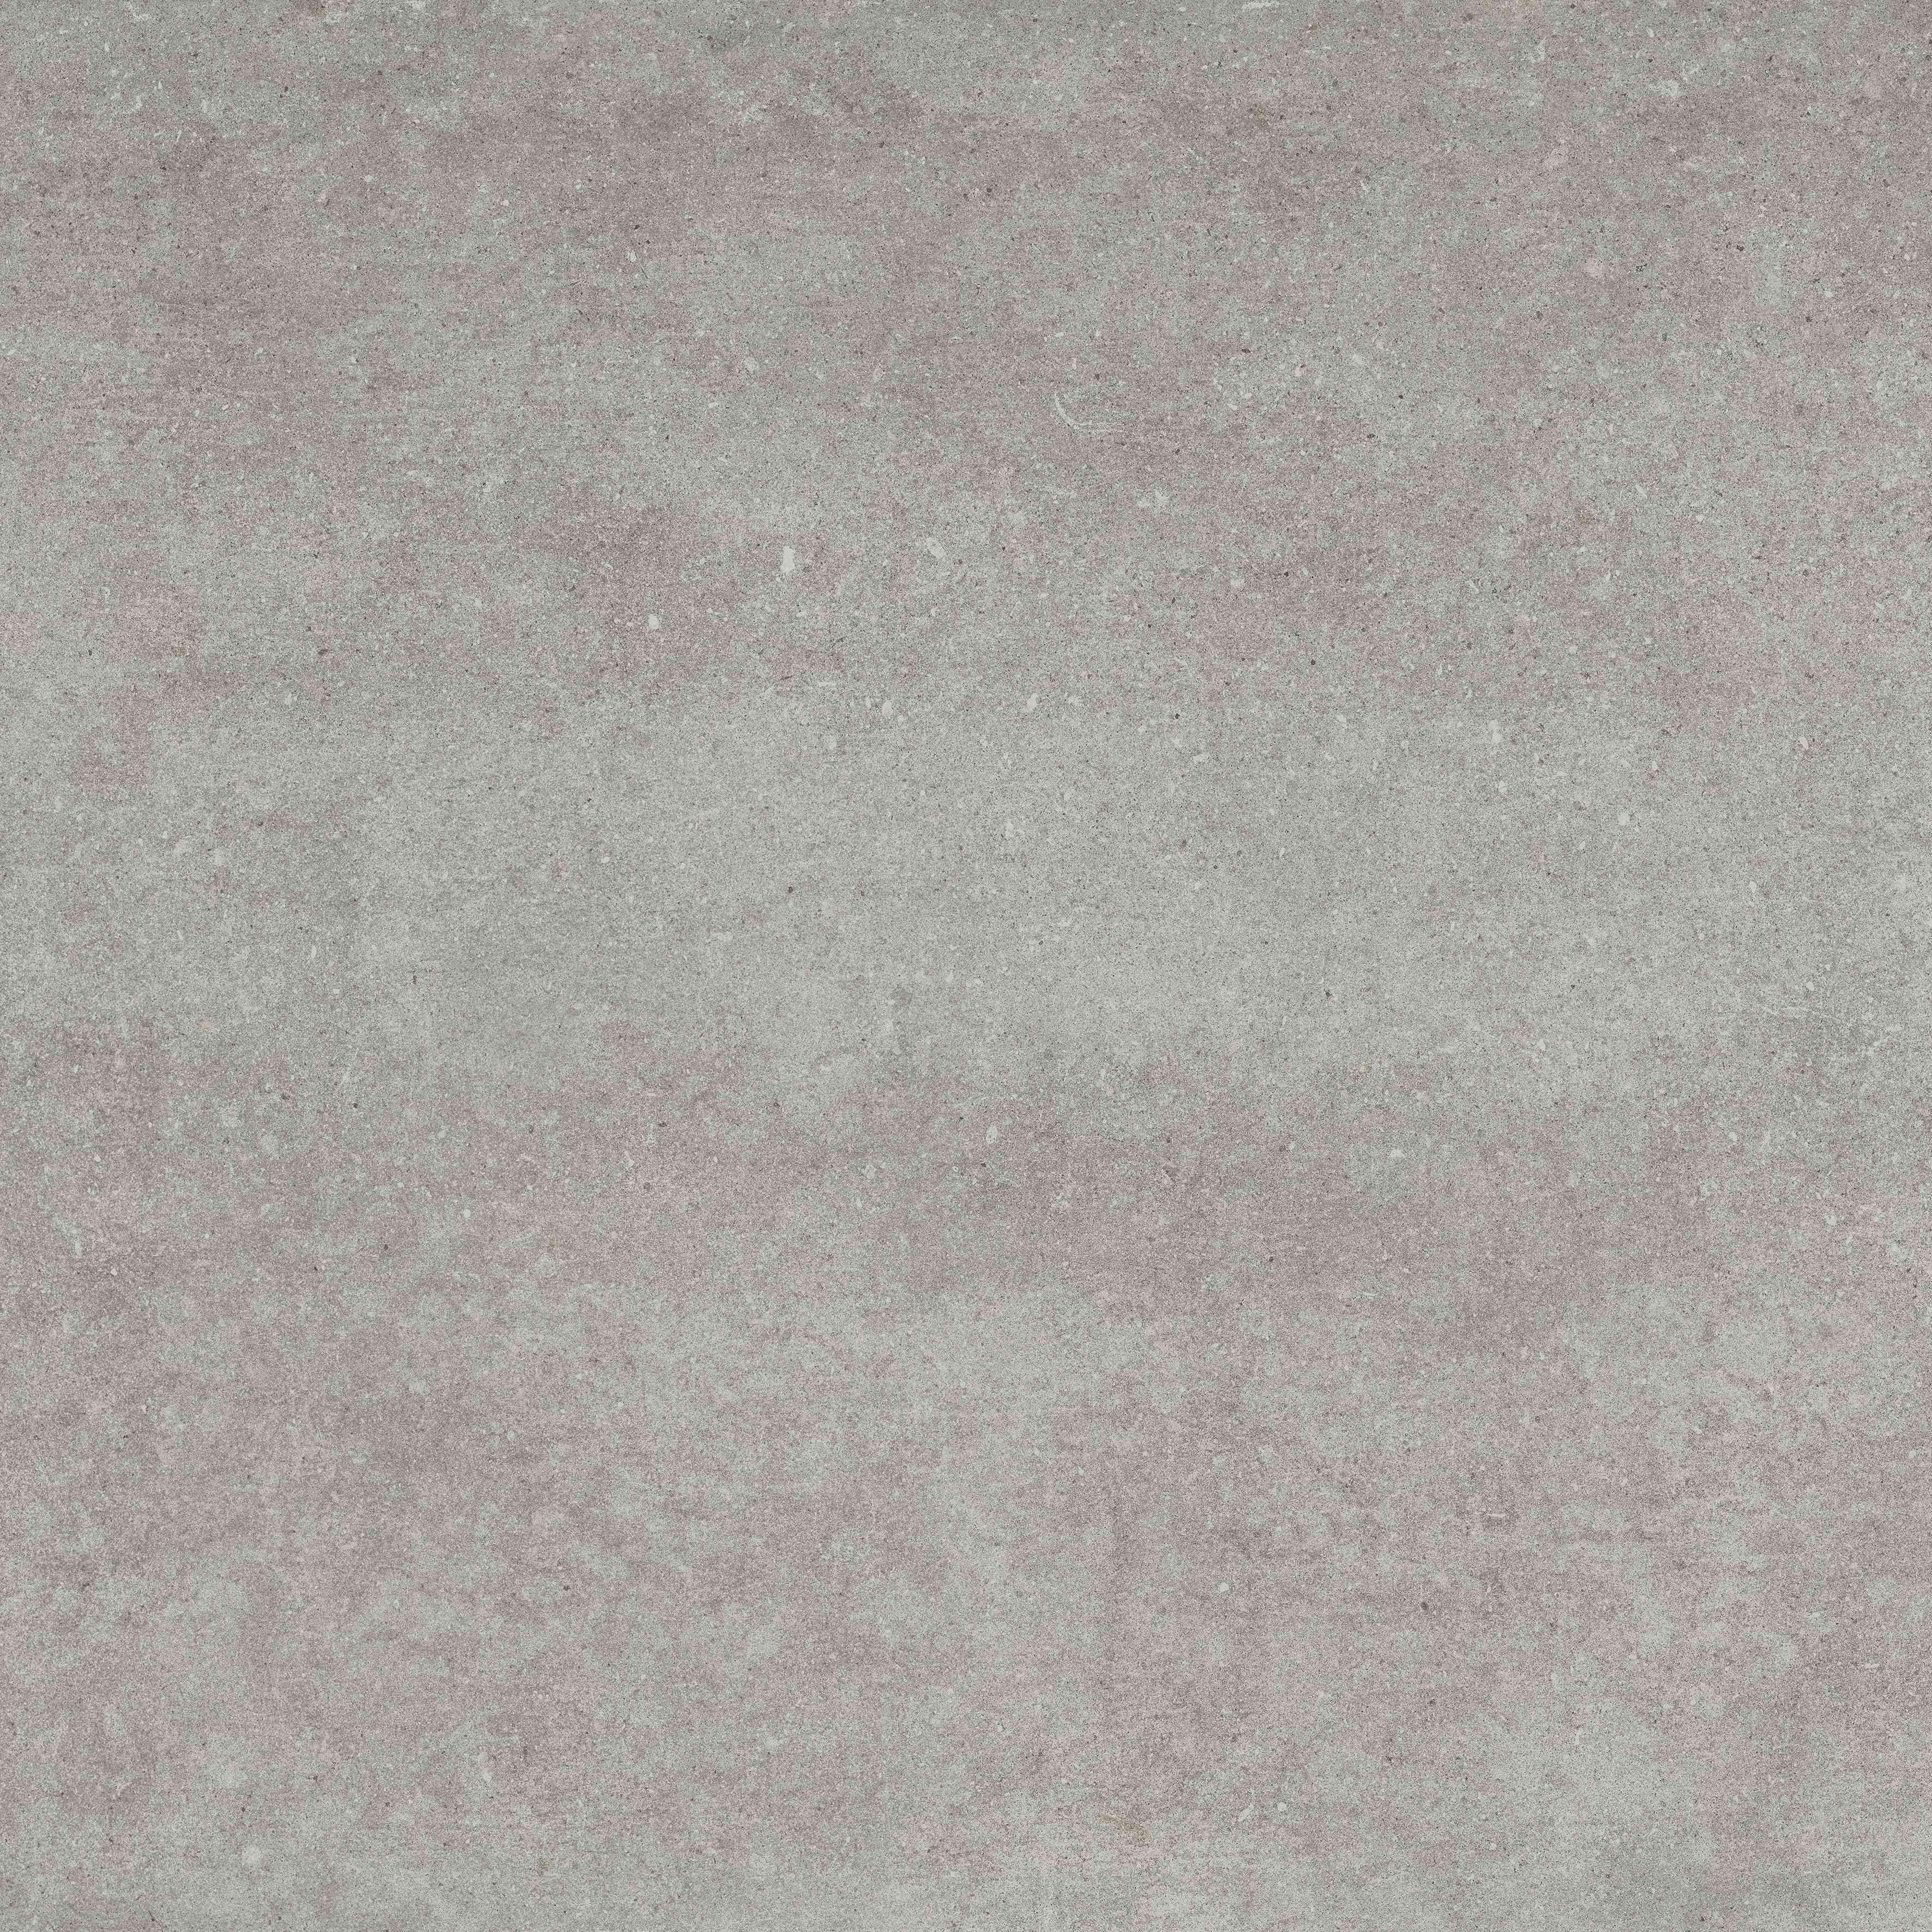 Плитка GRIGIO (ZRXRM8R) изображение 3